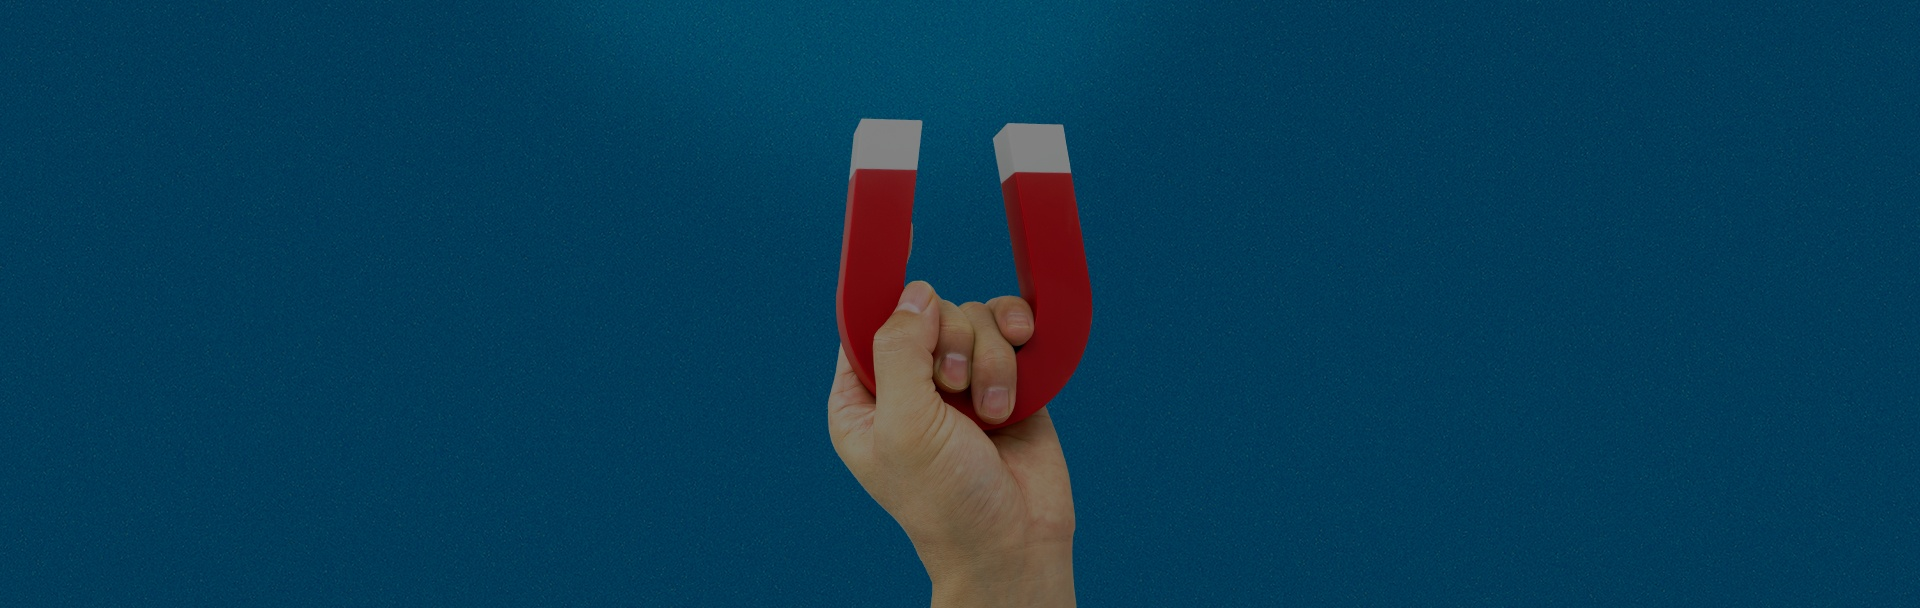 solucionweb-banner-blog-deja-que-los-leads-se-acercan-a-ti.jpg